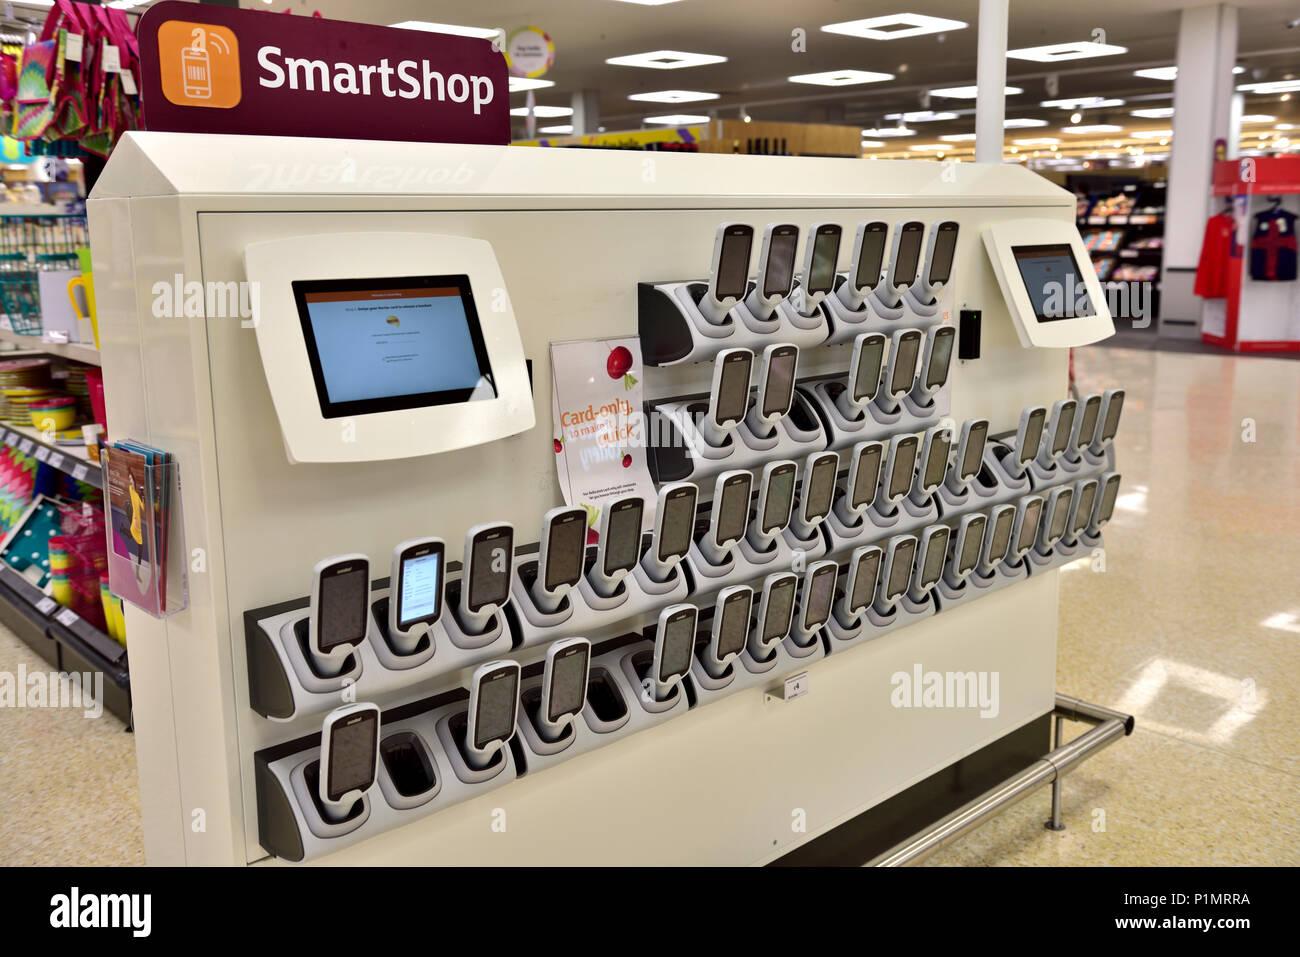 Bank of Sainsbury's SmartShop in store handsets on handset wall - Stock Image